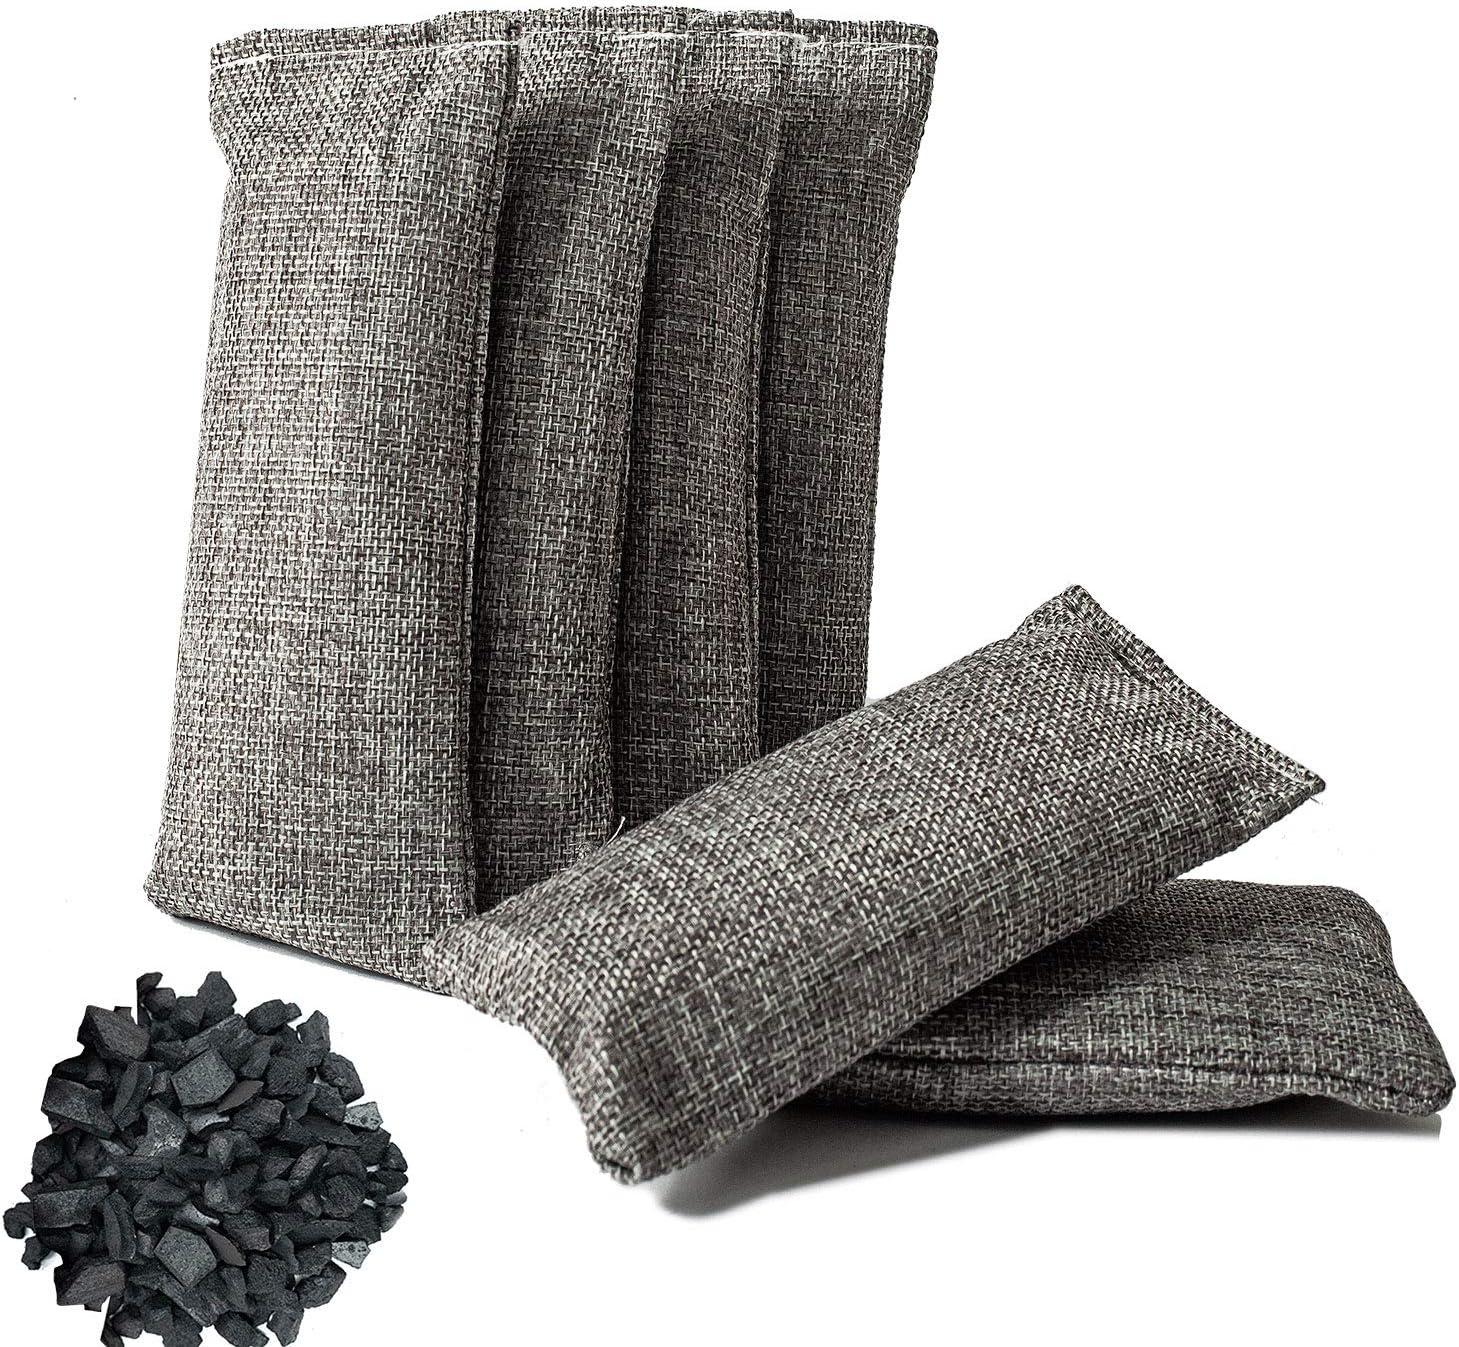 12 Packs Natural Air Max 41% OFF Purifying Bag Odor and Deodorizer Selling rankings Eli Shoe